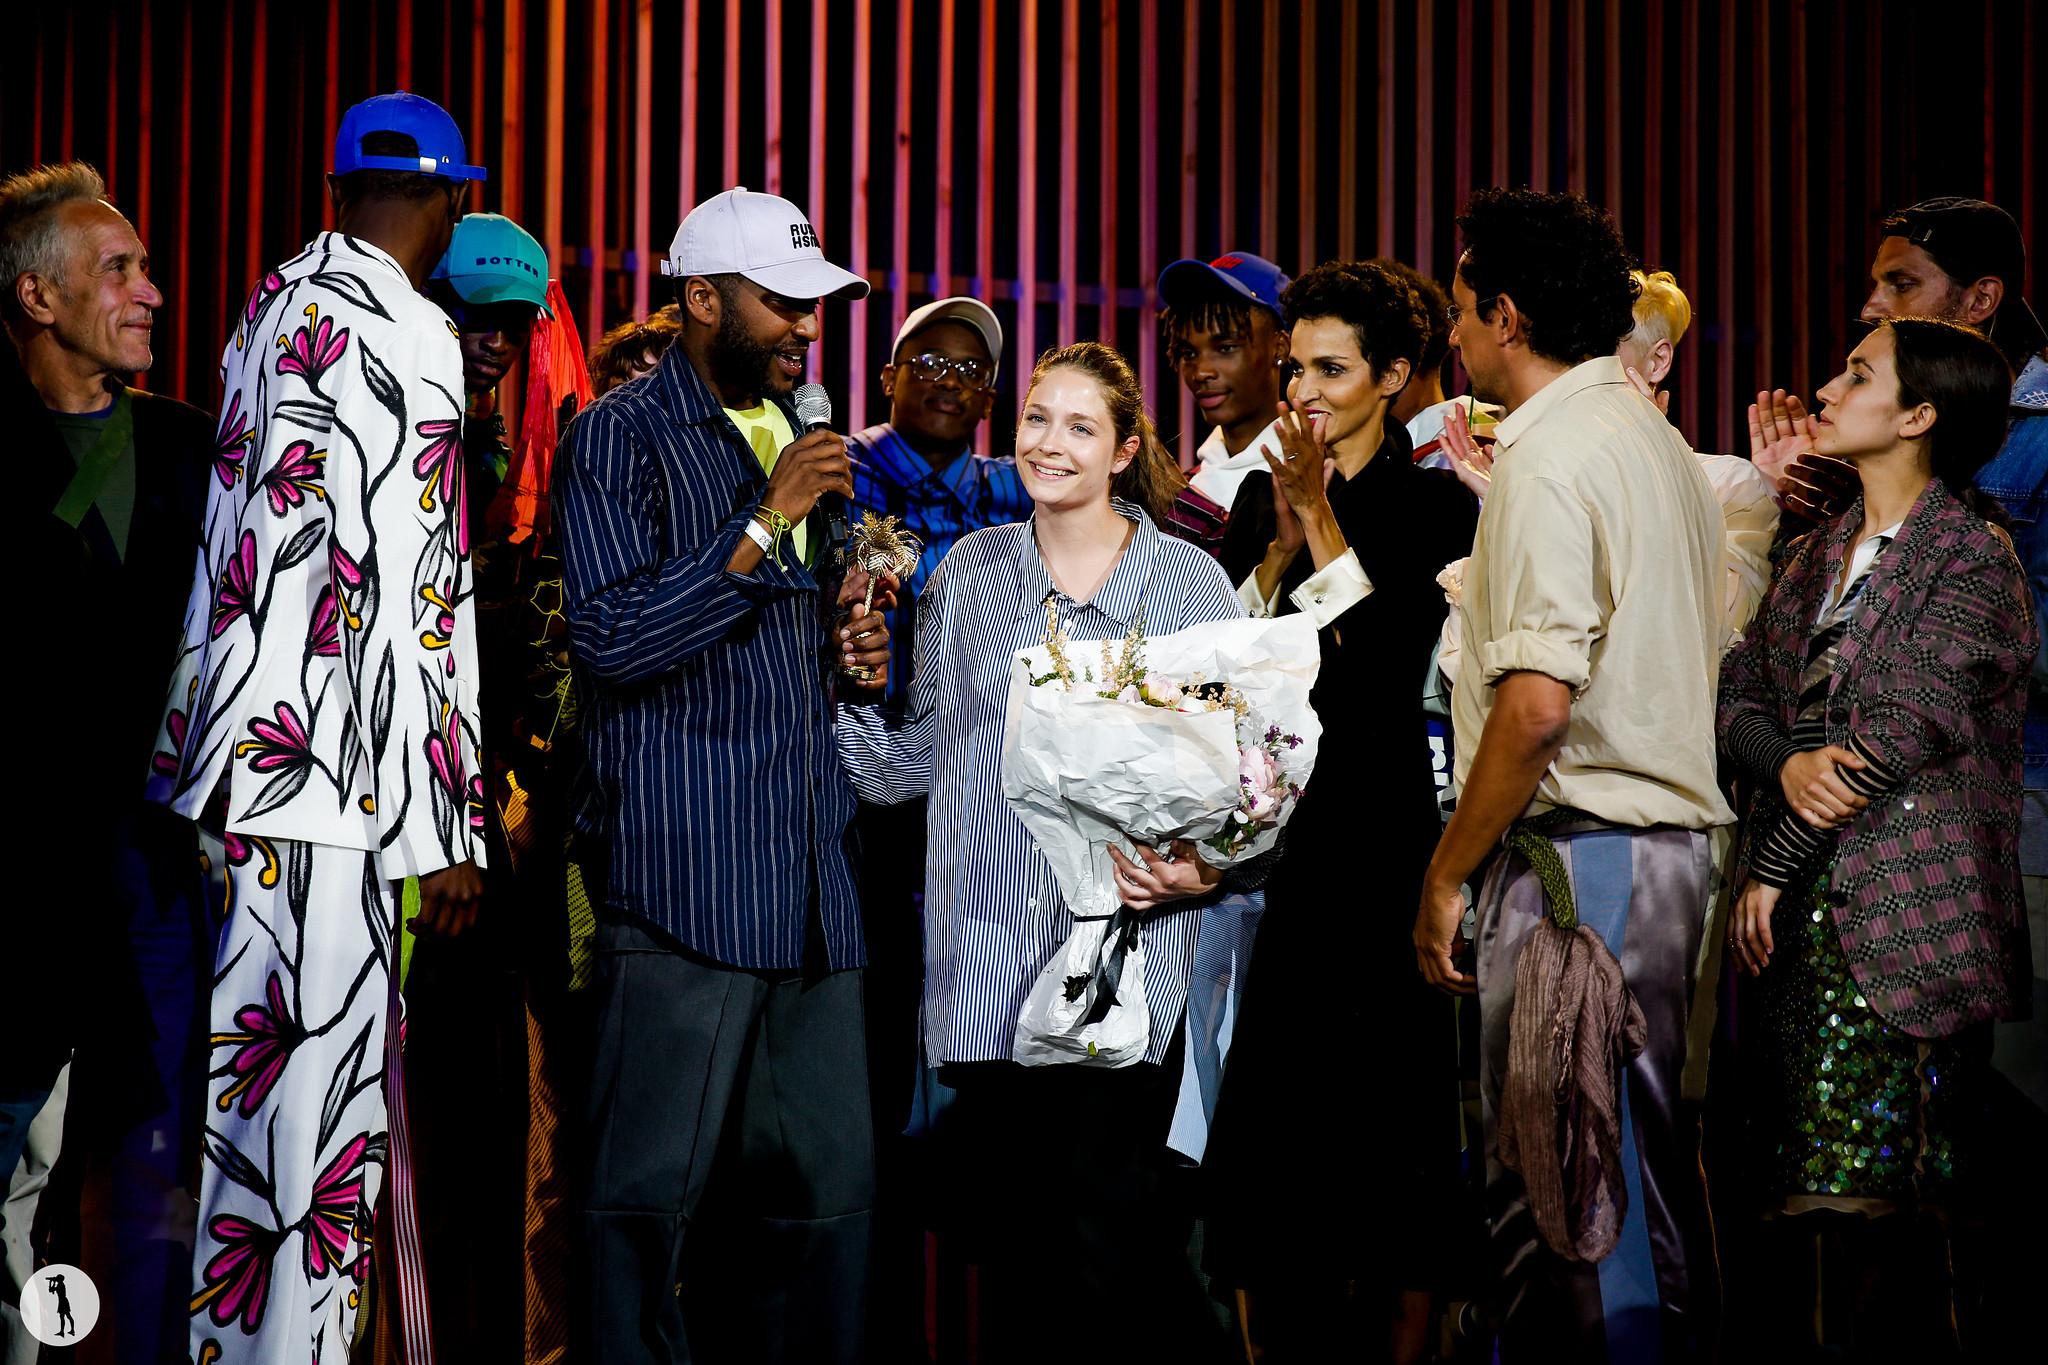 Grand Prix du Jury PREMIERE VISION (fashion) - Festival de Hyeres 2018 (7)